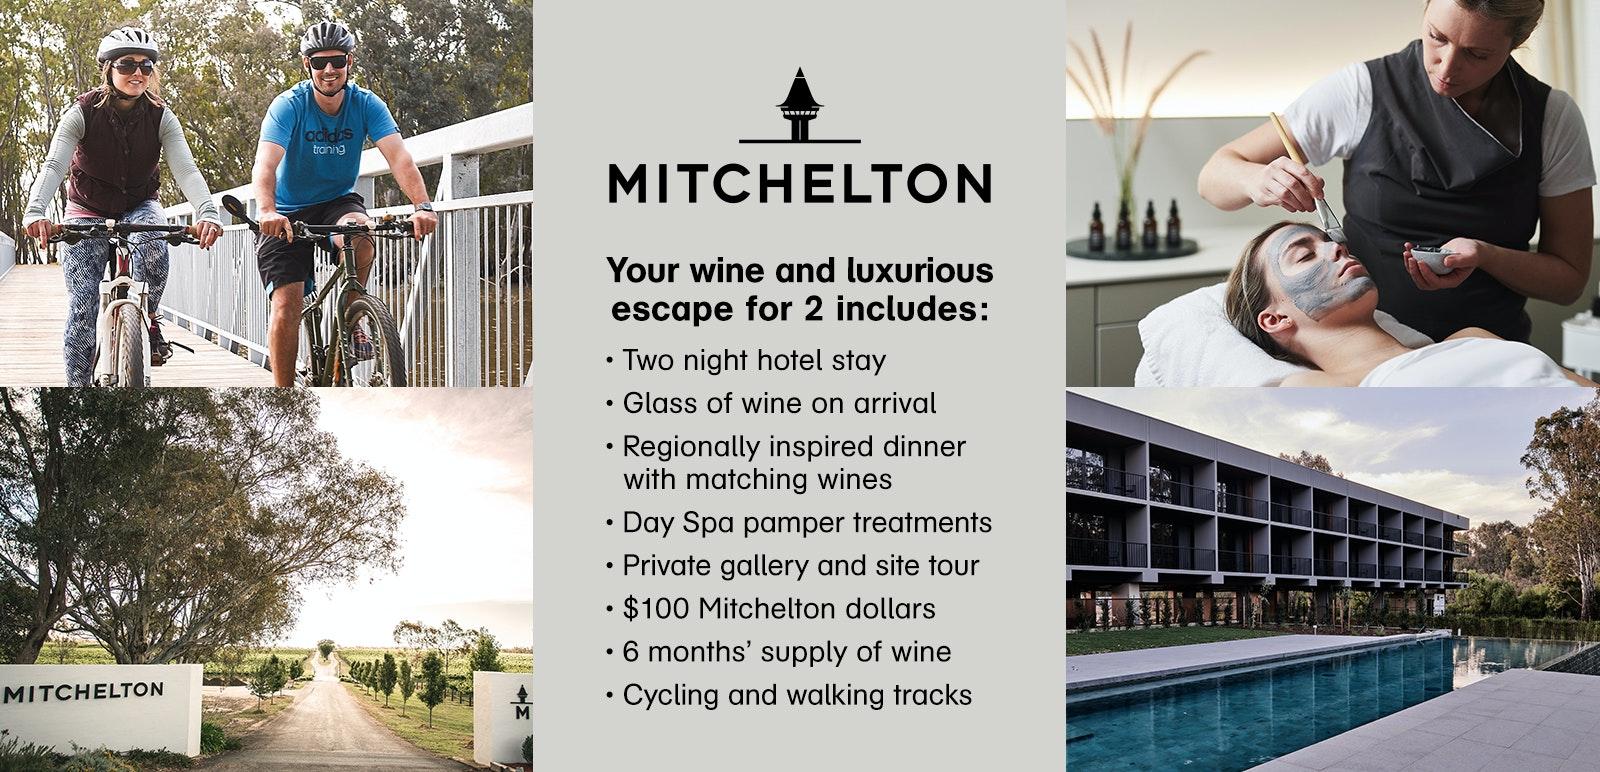 Mitchelton Tour de France 'Wine and Experience'